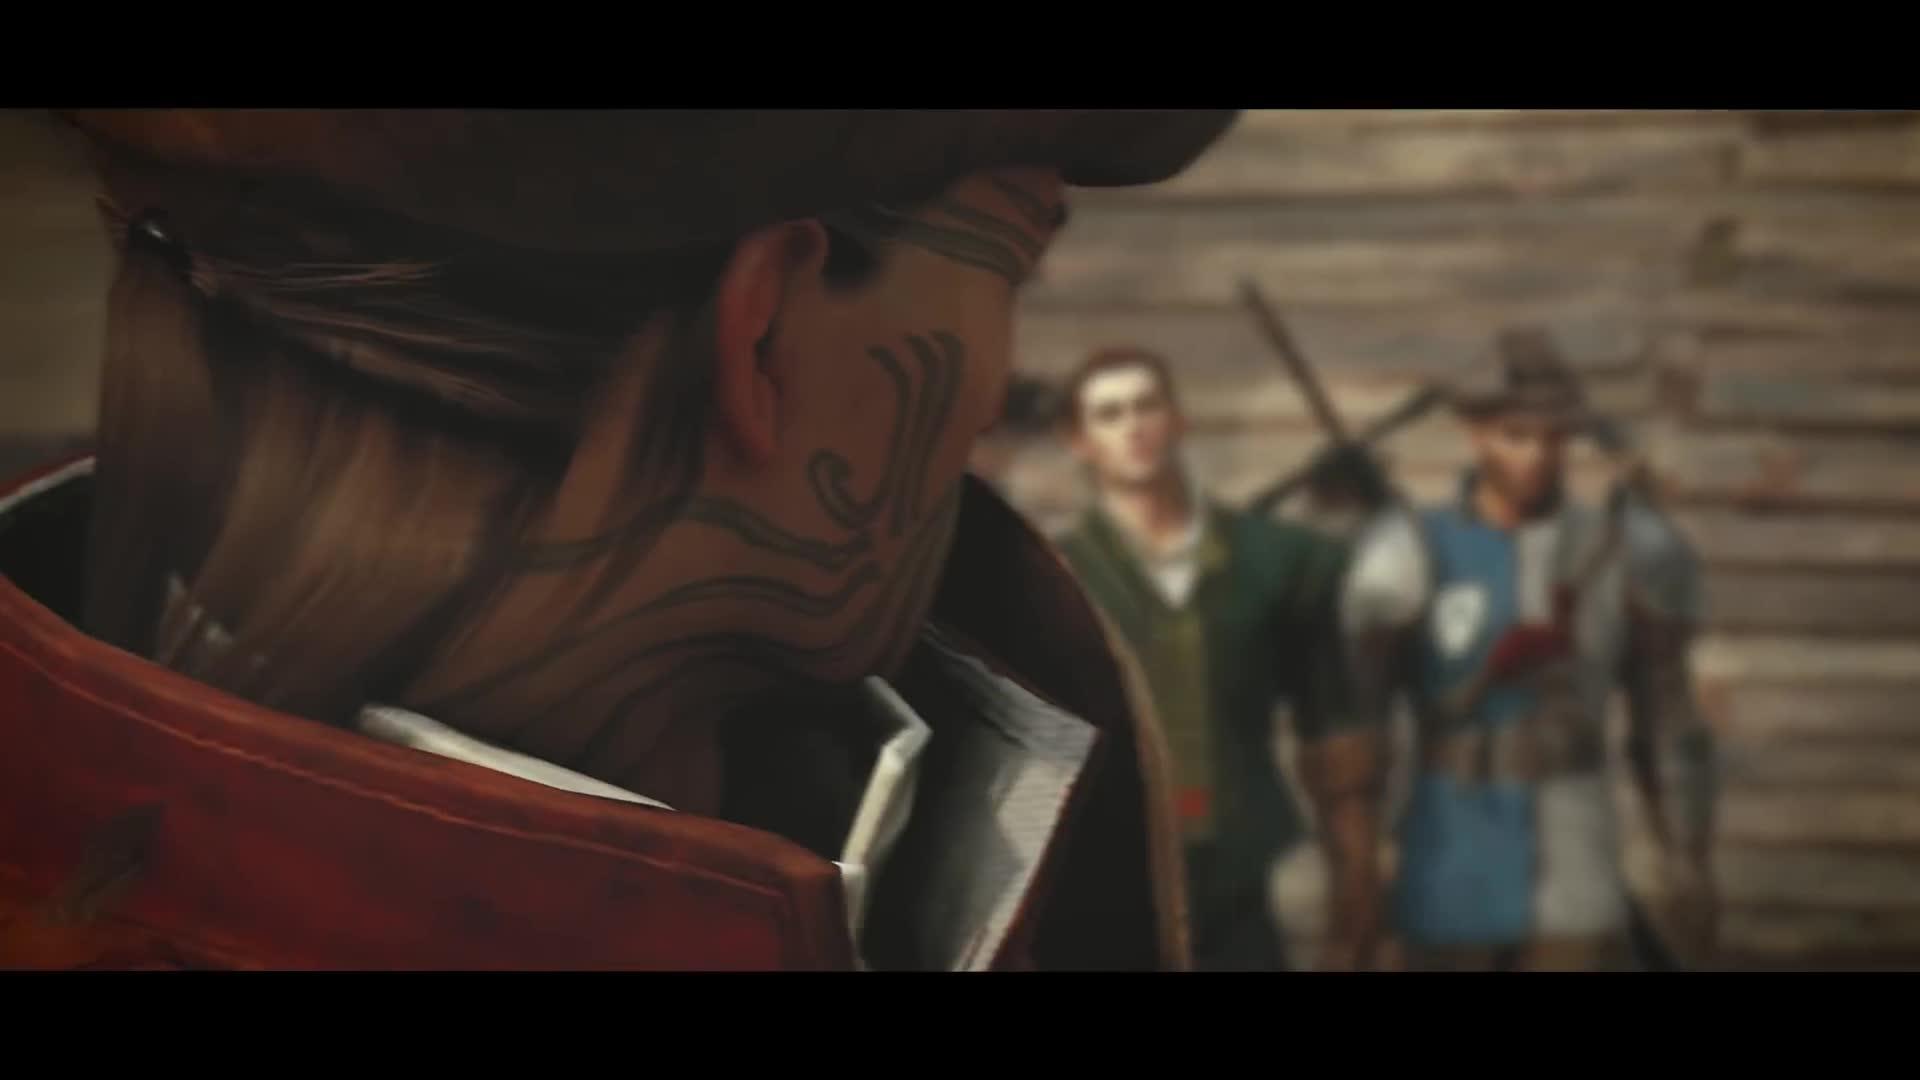 GreedFall - Story Trailer [HD] screen capture